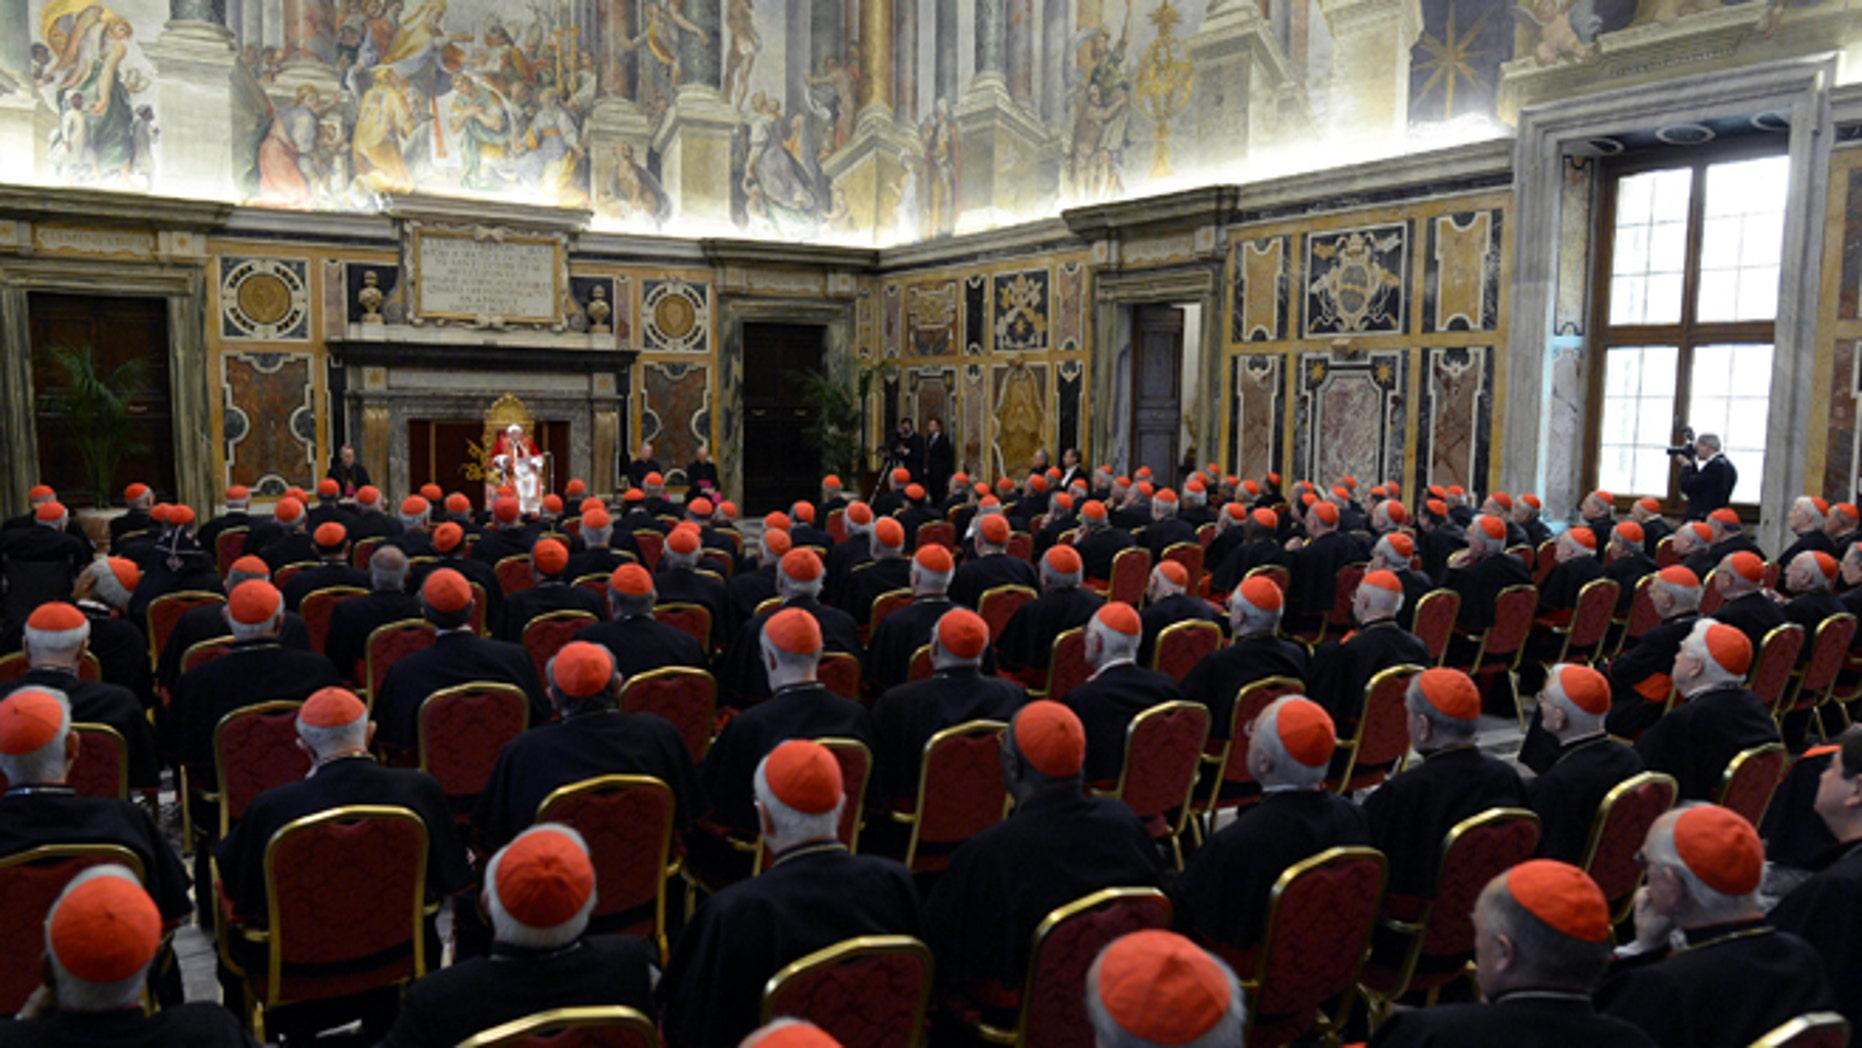 (Photo AP/L'Osservatore Romano, ho)